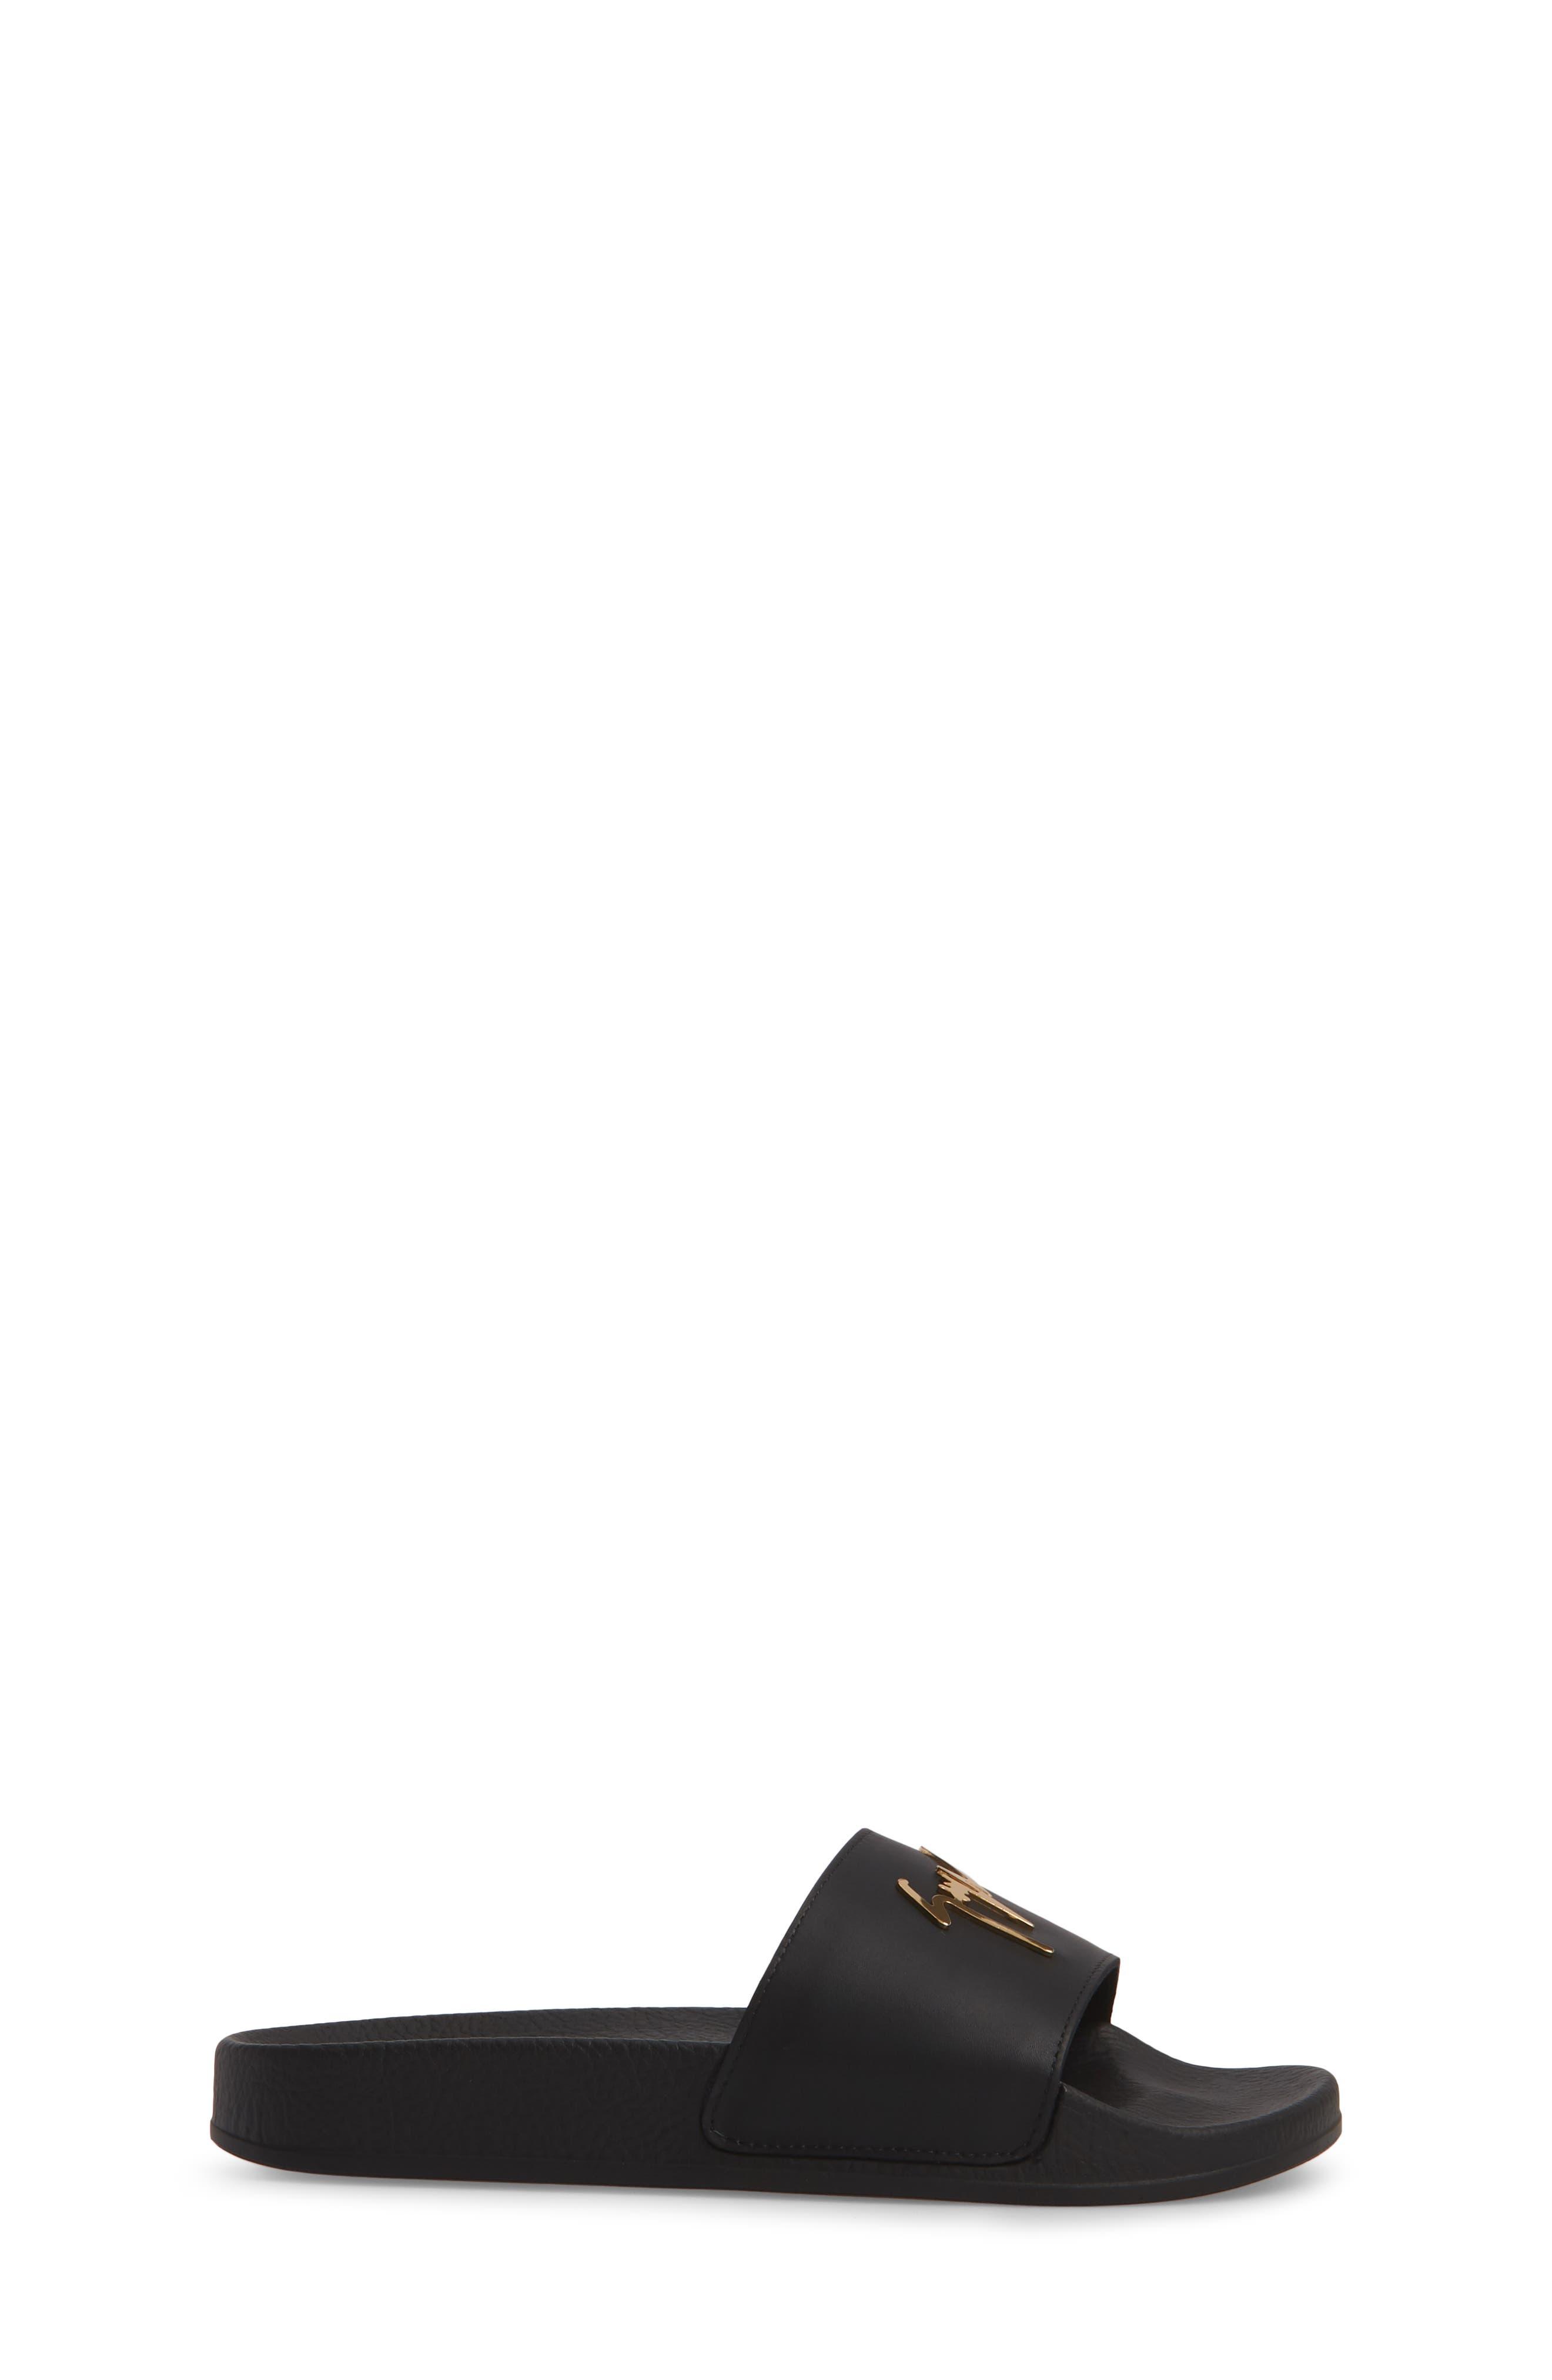 Birel Slide Sandal,                             Alternate thumbnail 3, color,                             Black Leather